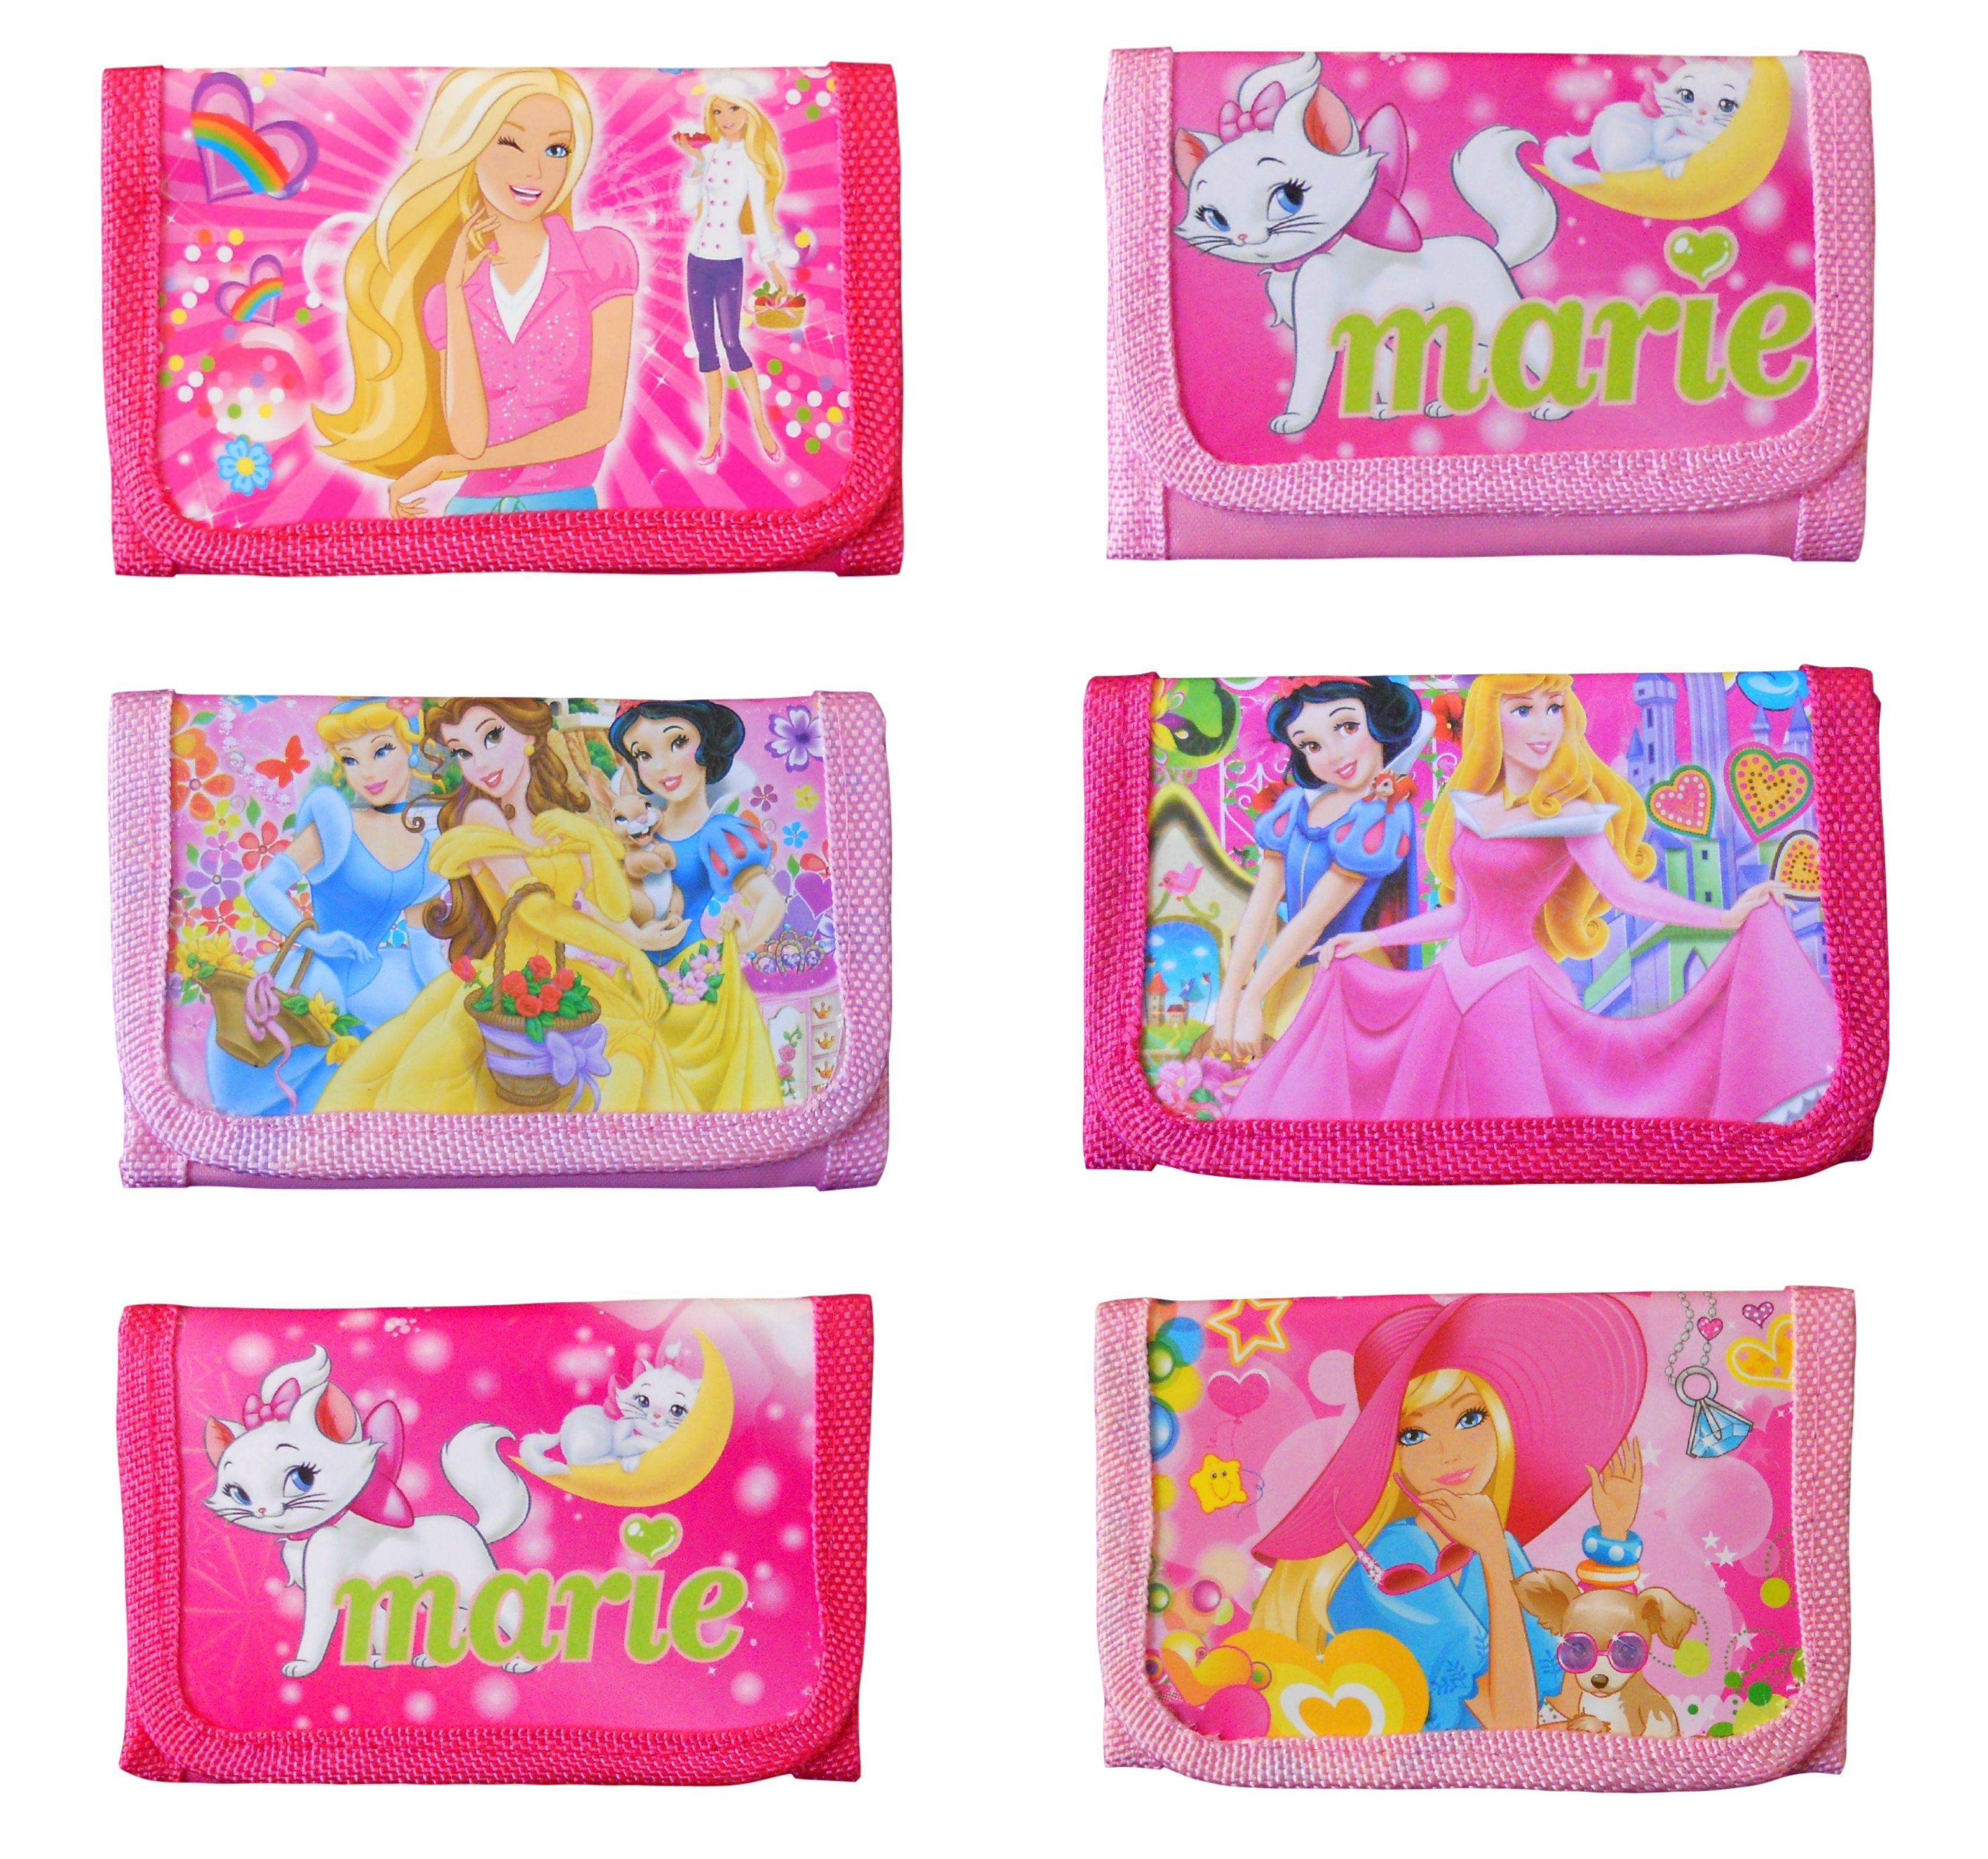 32.49 - New Children Wallet Disney Princesses Cute Cartoon Kids Girls Gift Party Bag UK